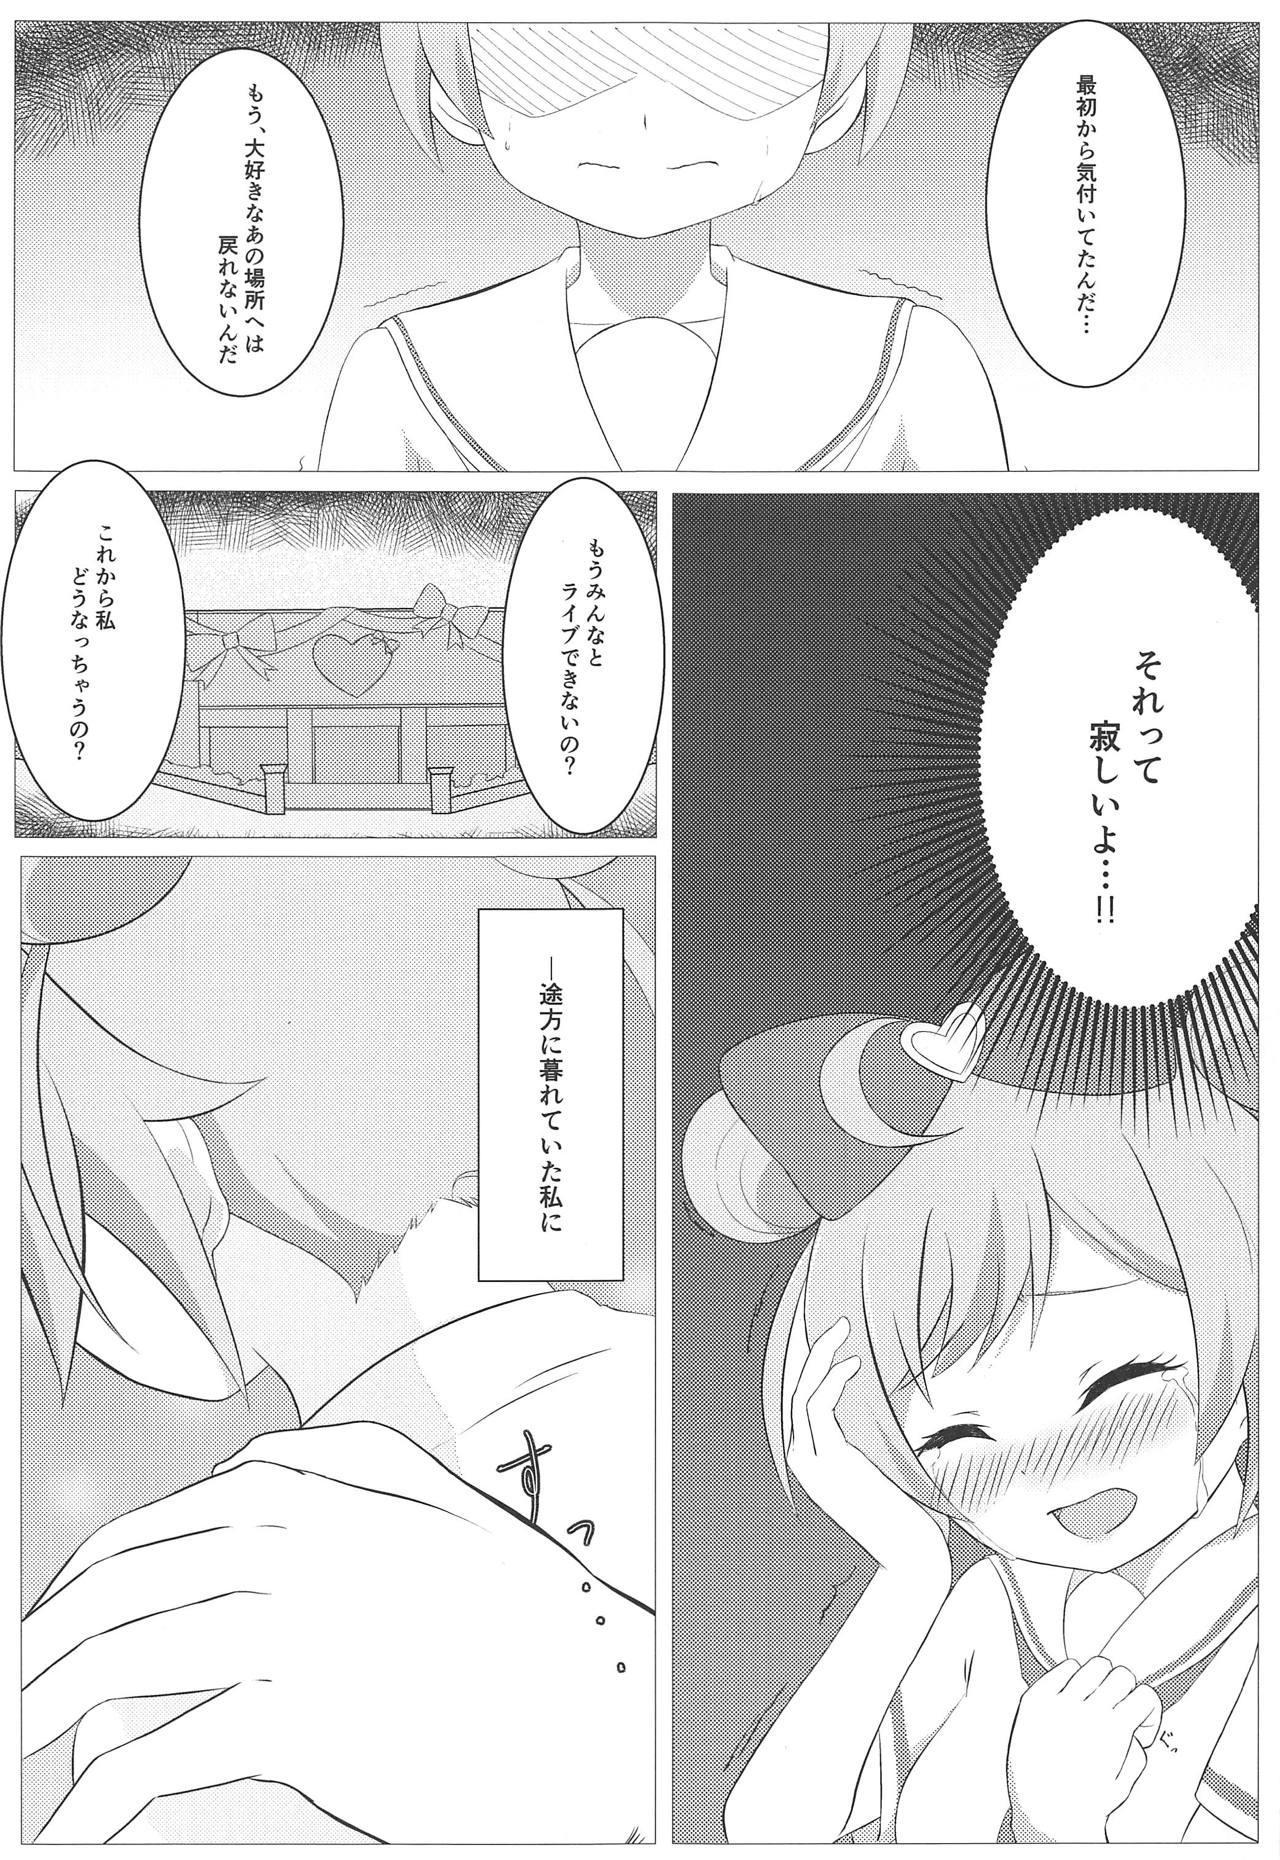 Kami Idol Rachitte Mita! 5